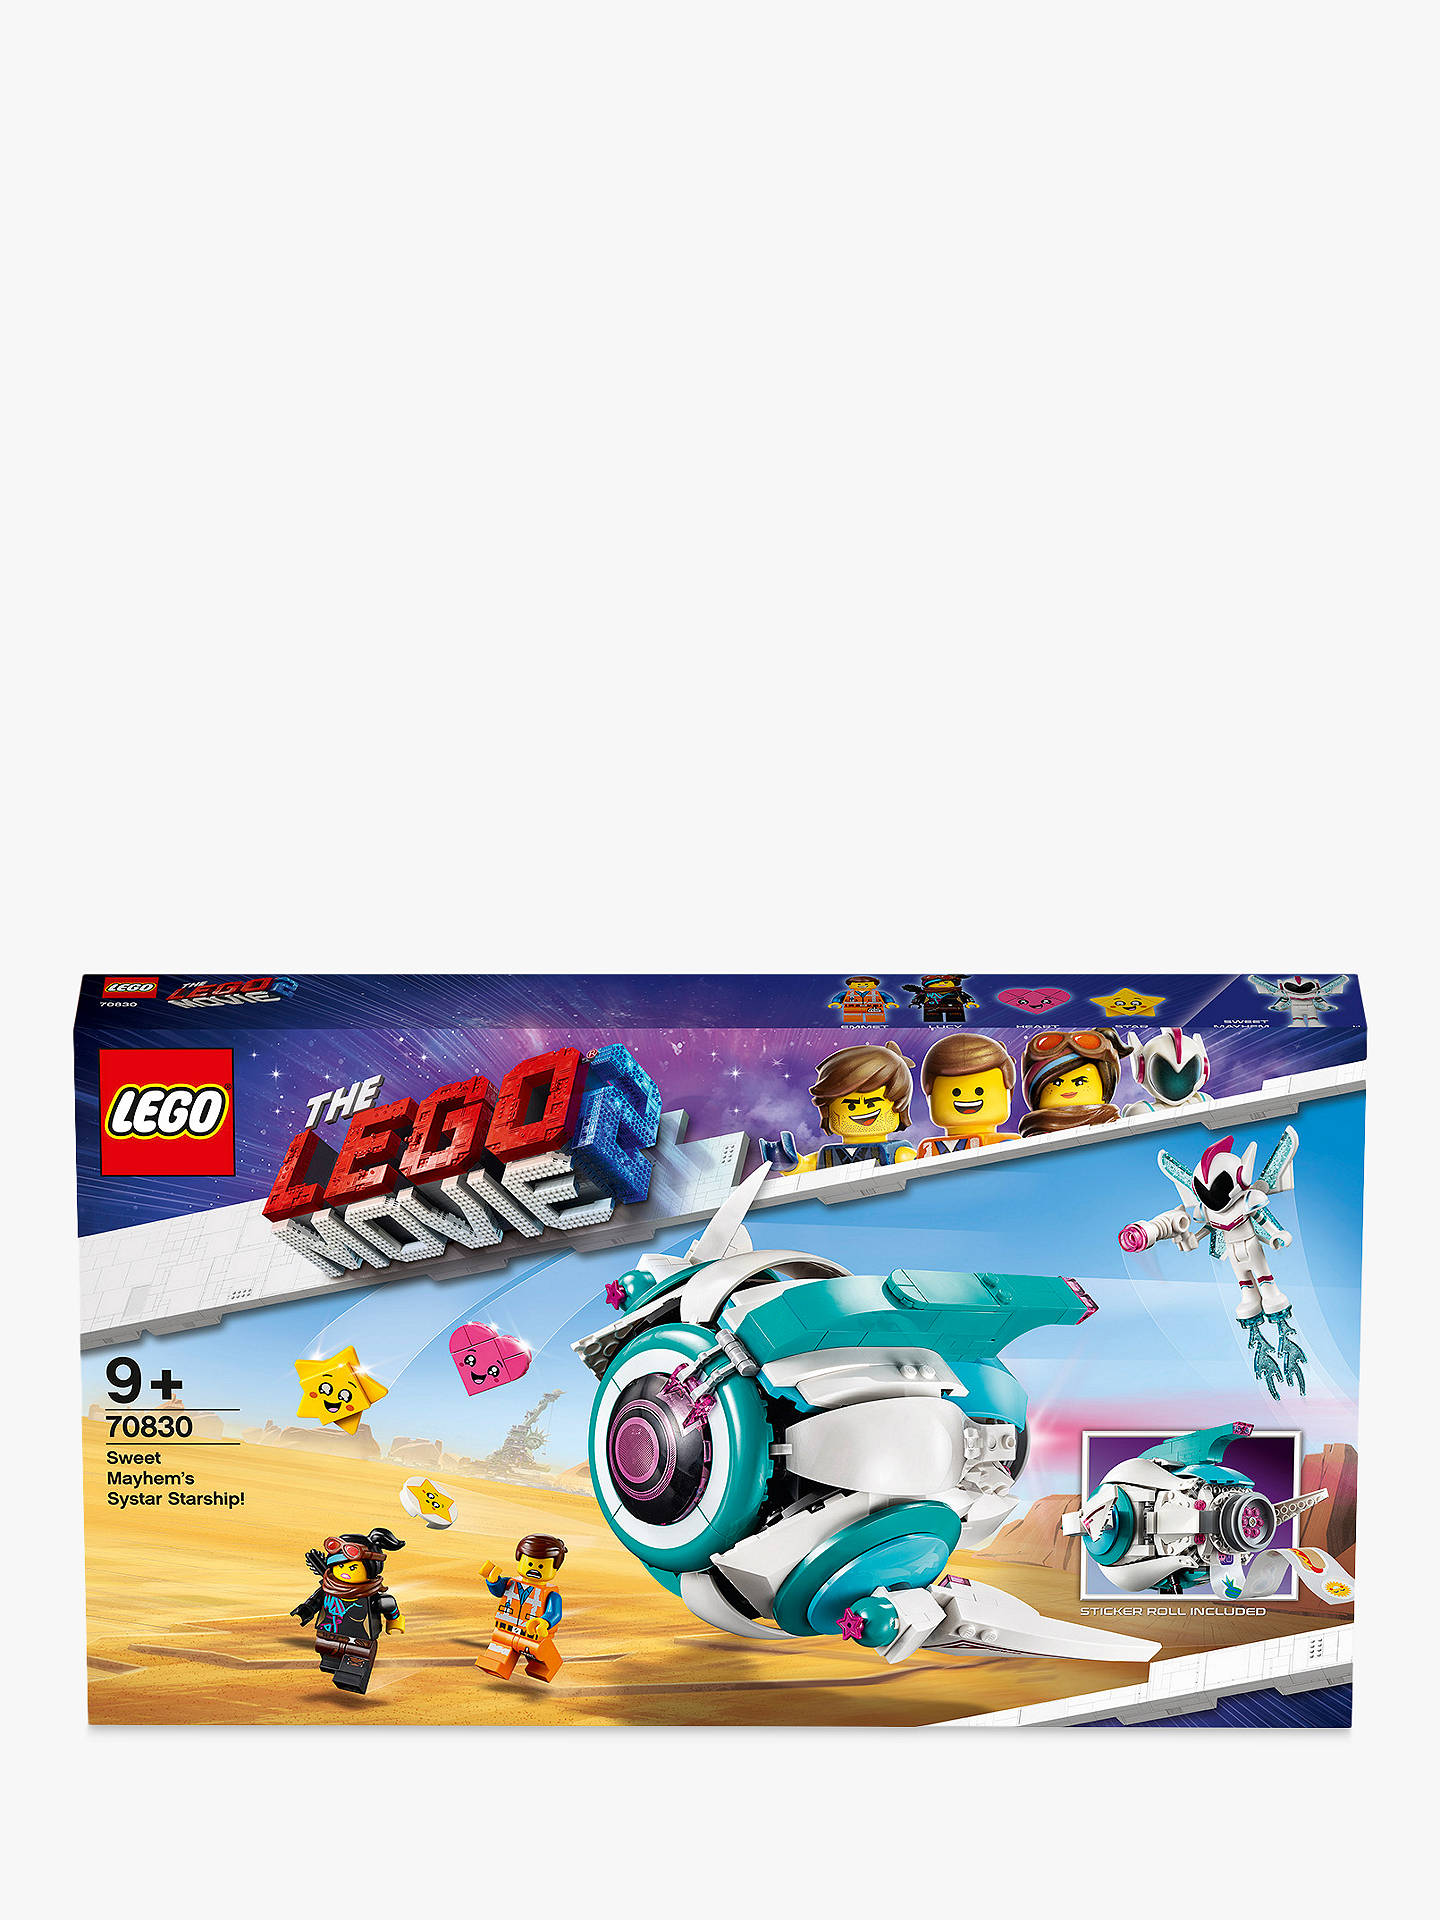 Lego The Lego Movie 2 70830 Sweet Mayhem S Systar Starship At John Lewis Partners